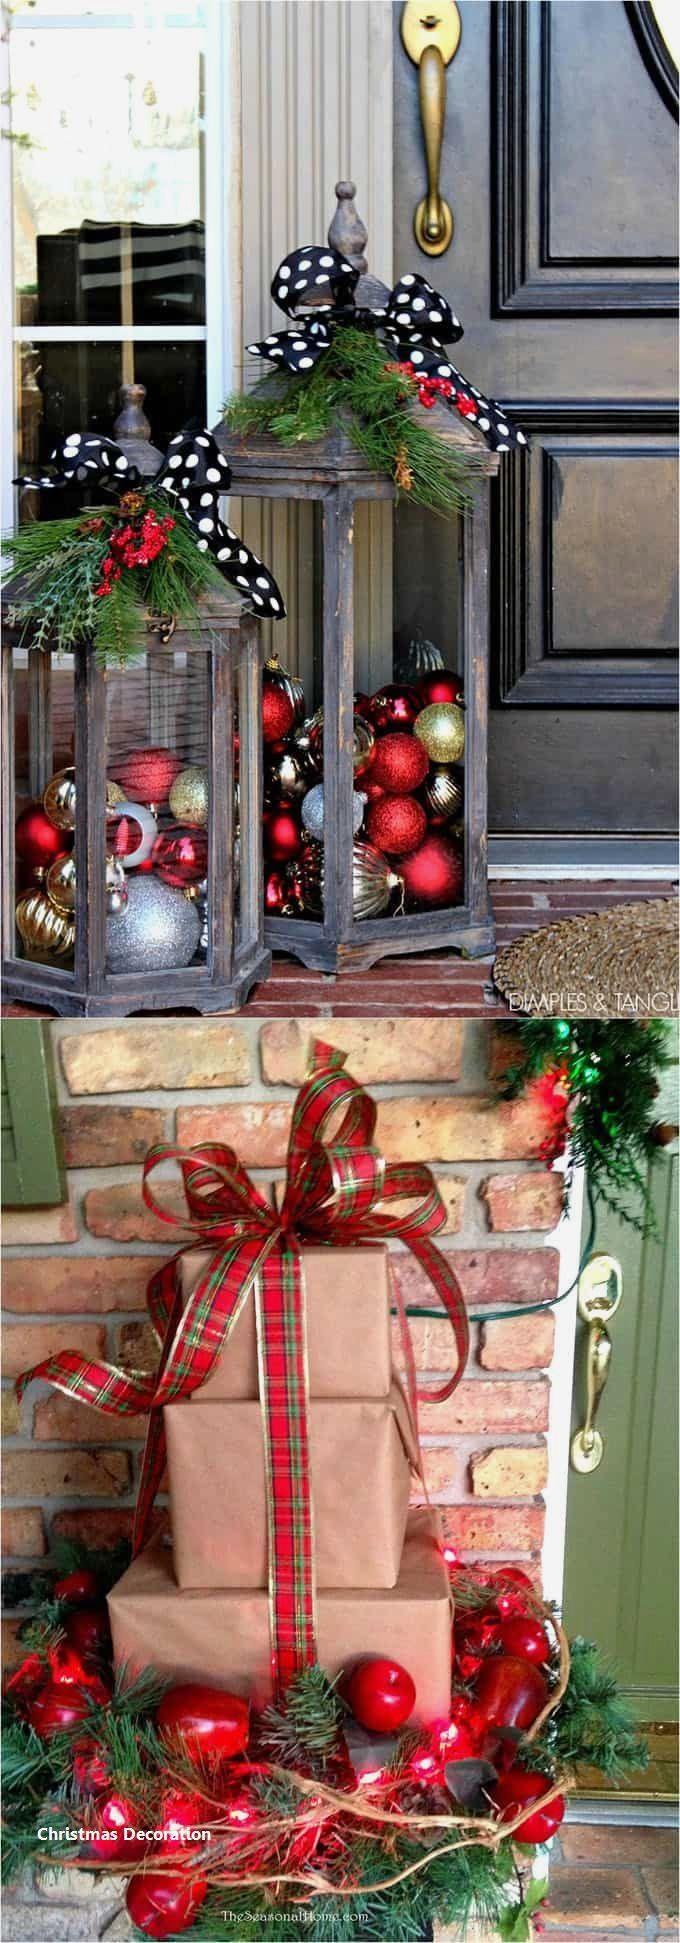 15 Cheap and Easy Christmas DIY Decoration Ideas 1 | Christmas ...